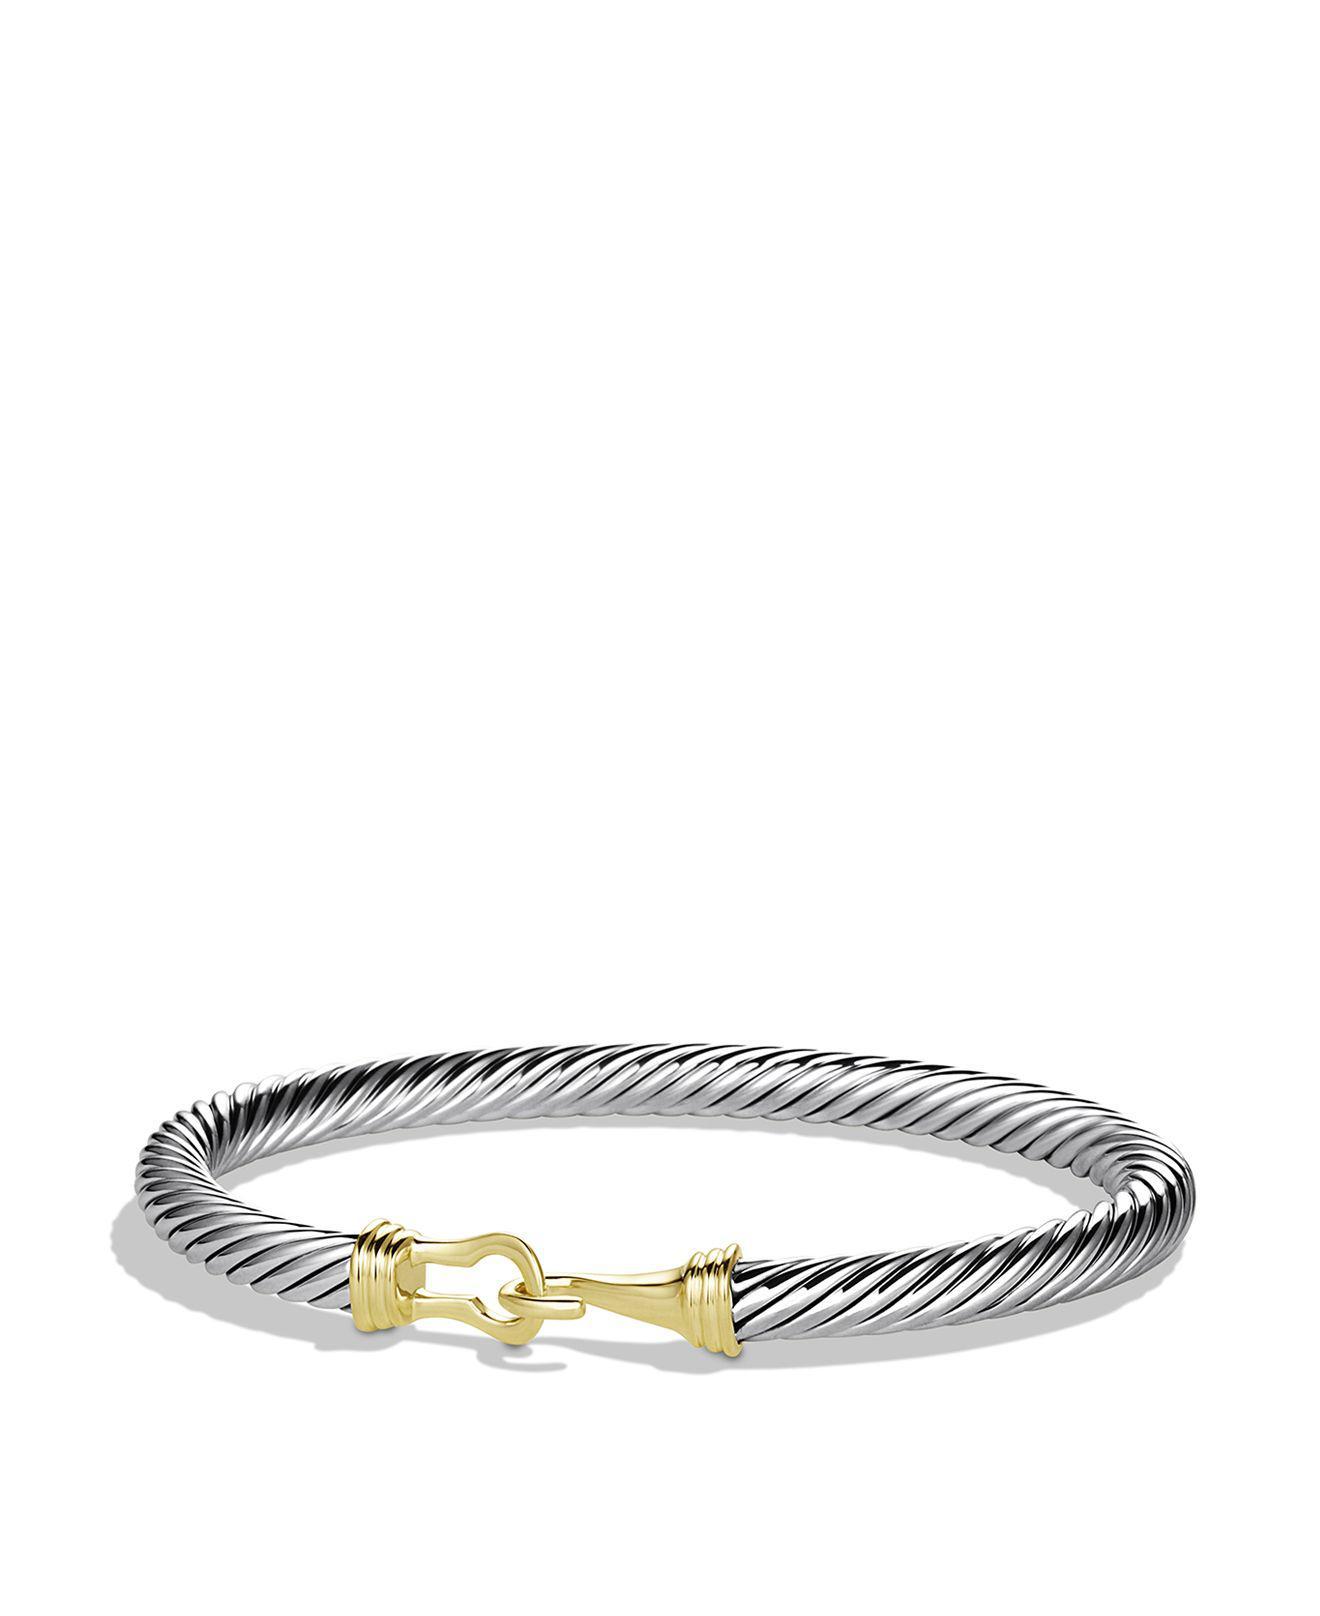 Cable buckle bracelet - Metallic David Yurman KNuuCfQ